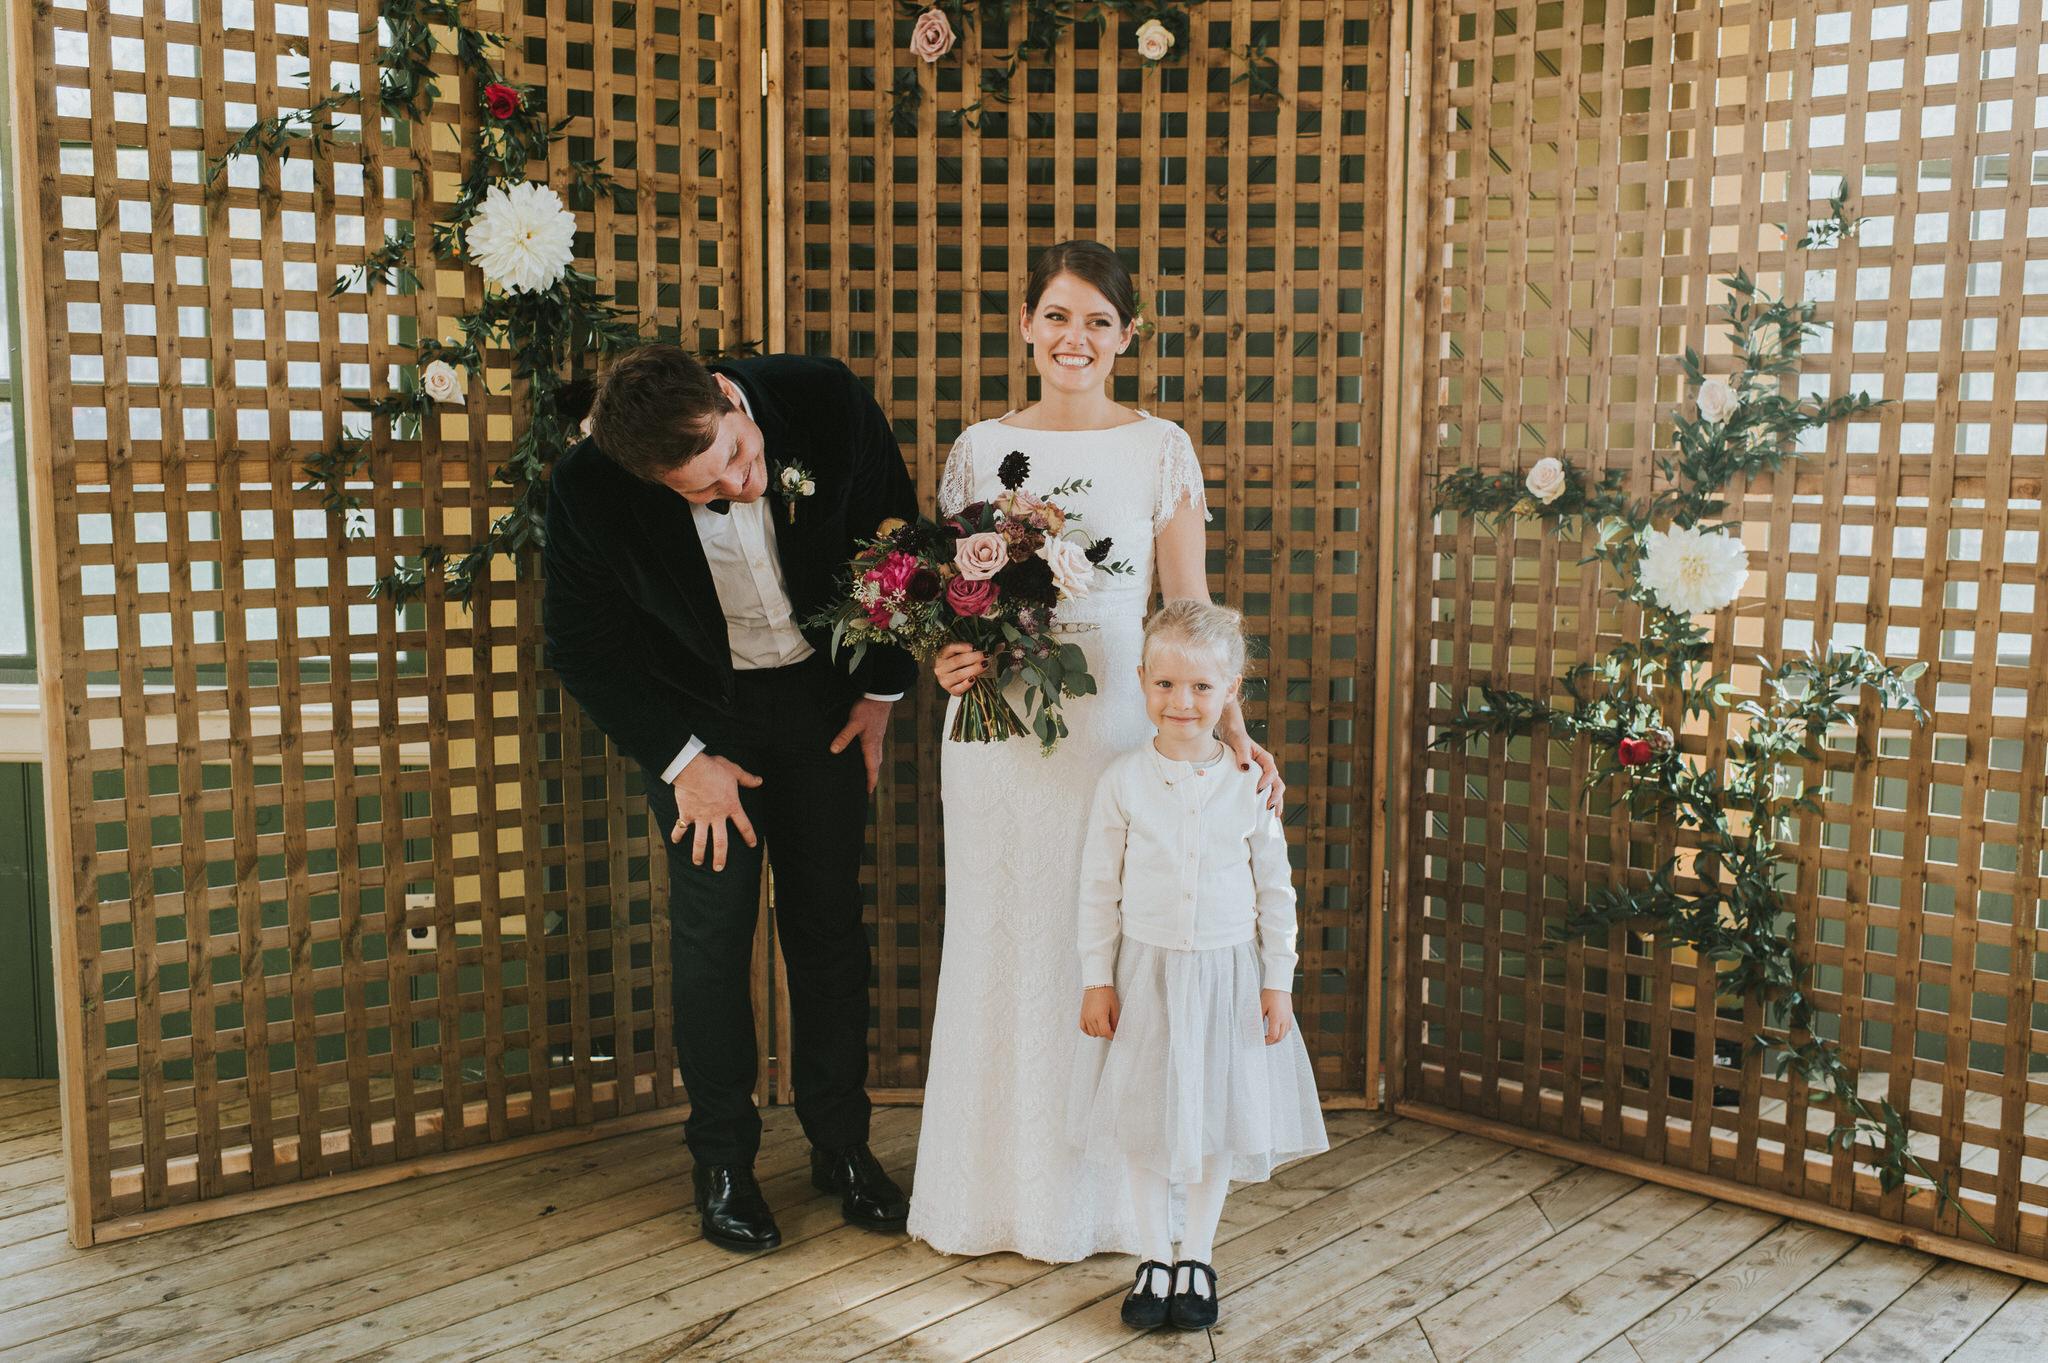 scarletoneillphotography_weddingphotography_prince edward county weddings130.JPG